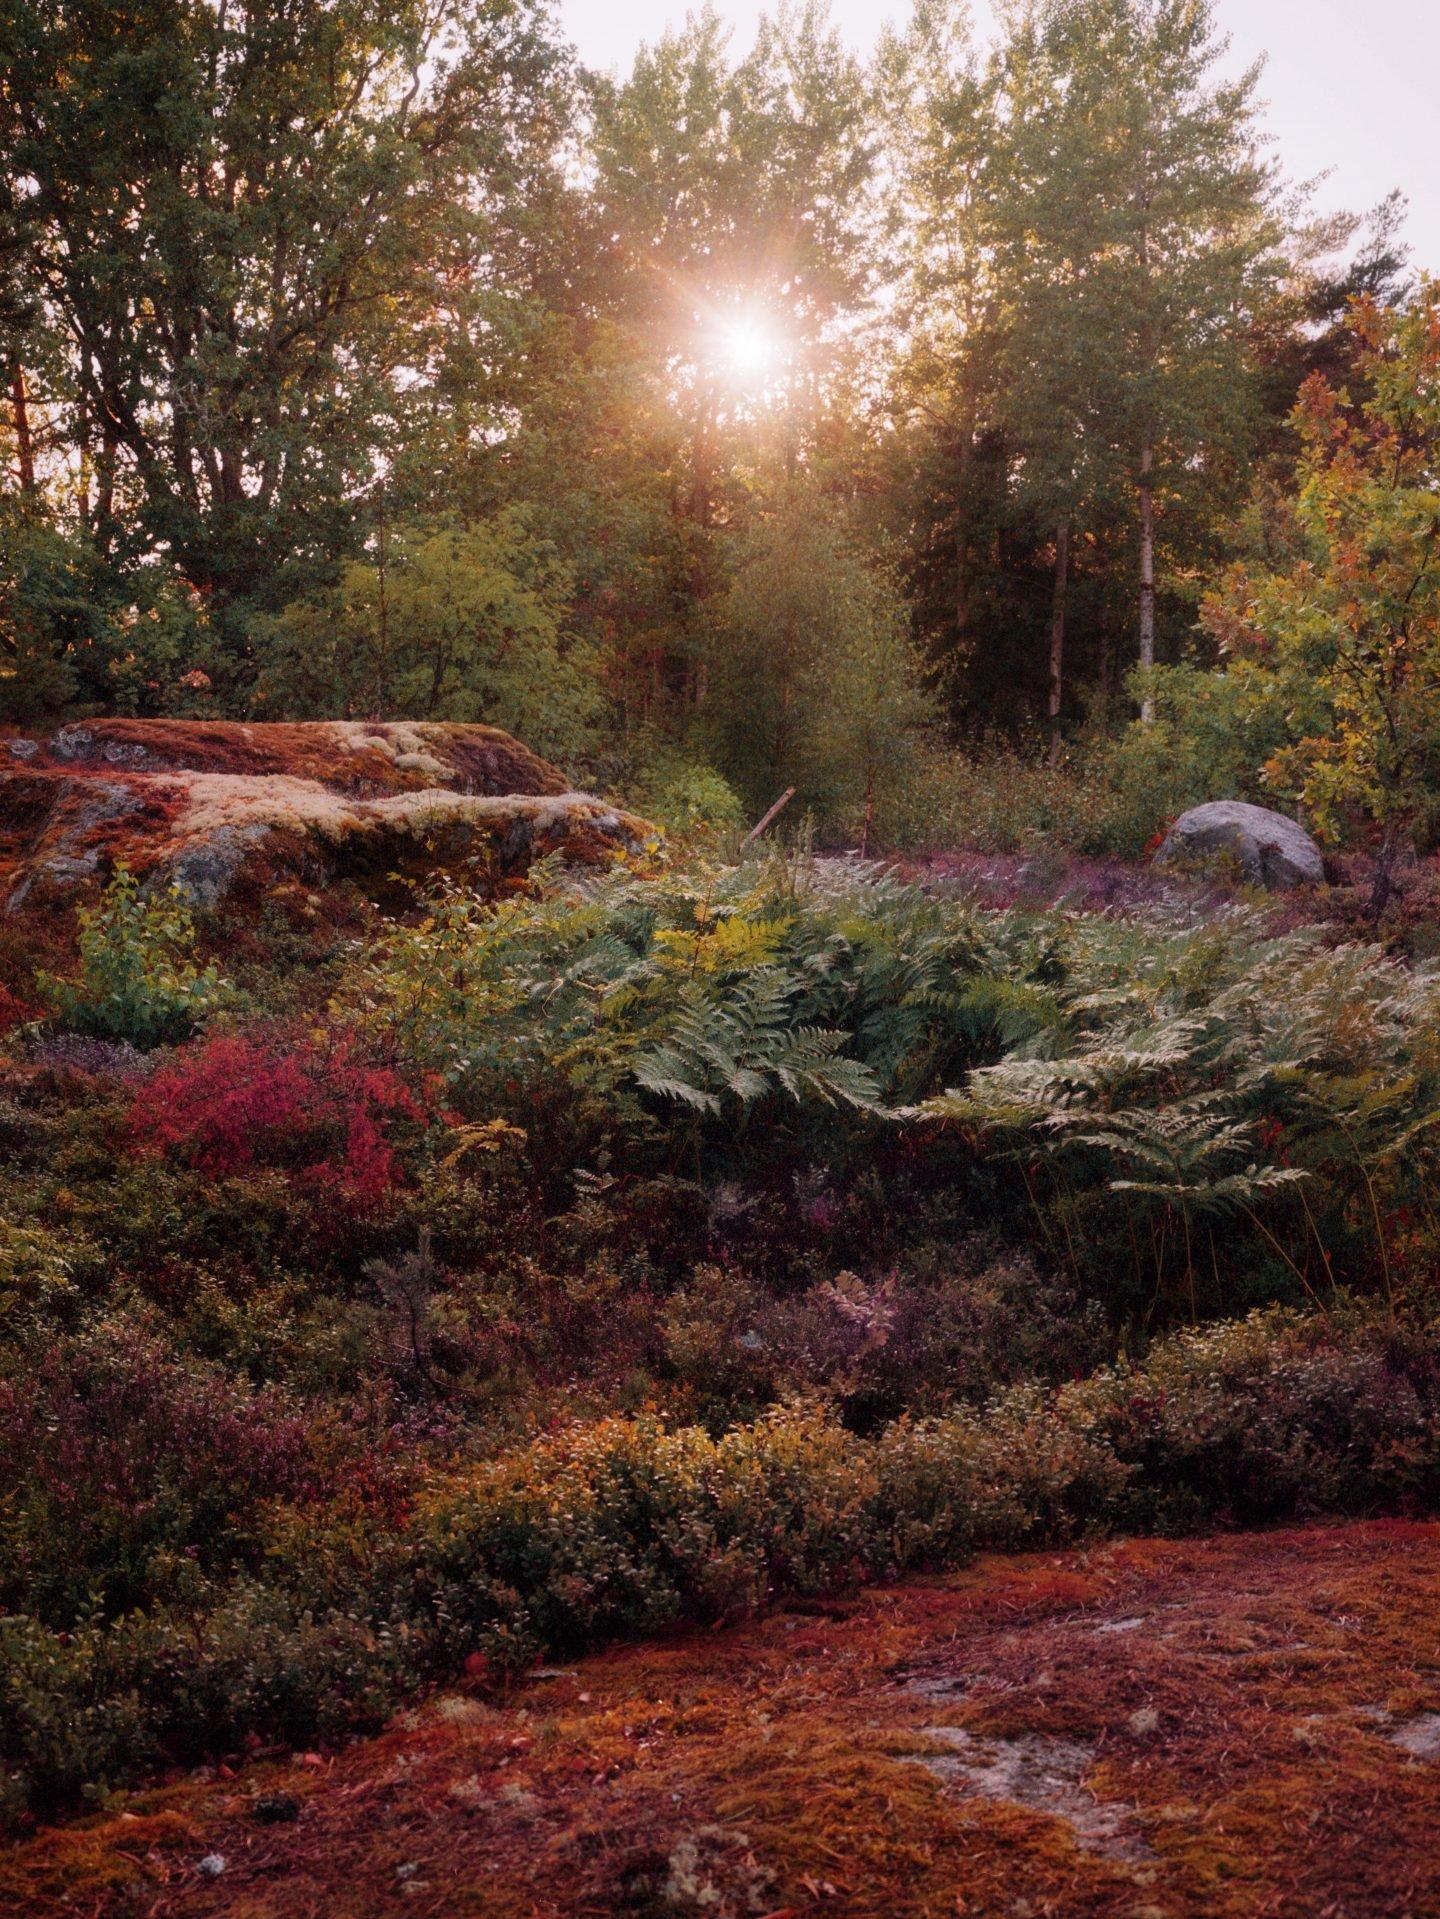 IGNANT-Photography-Jacques-Brun-Sunset-Garden-04